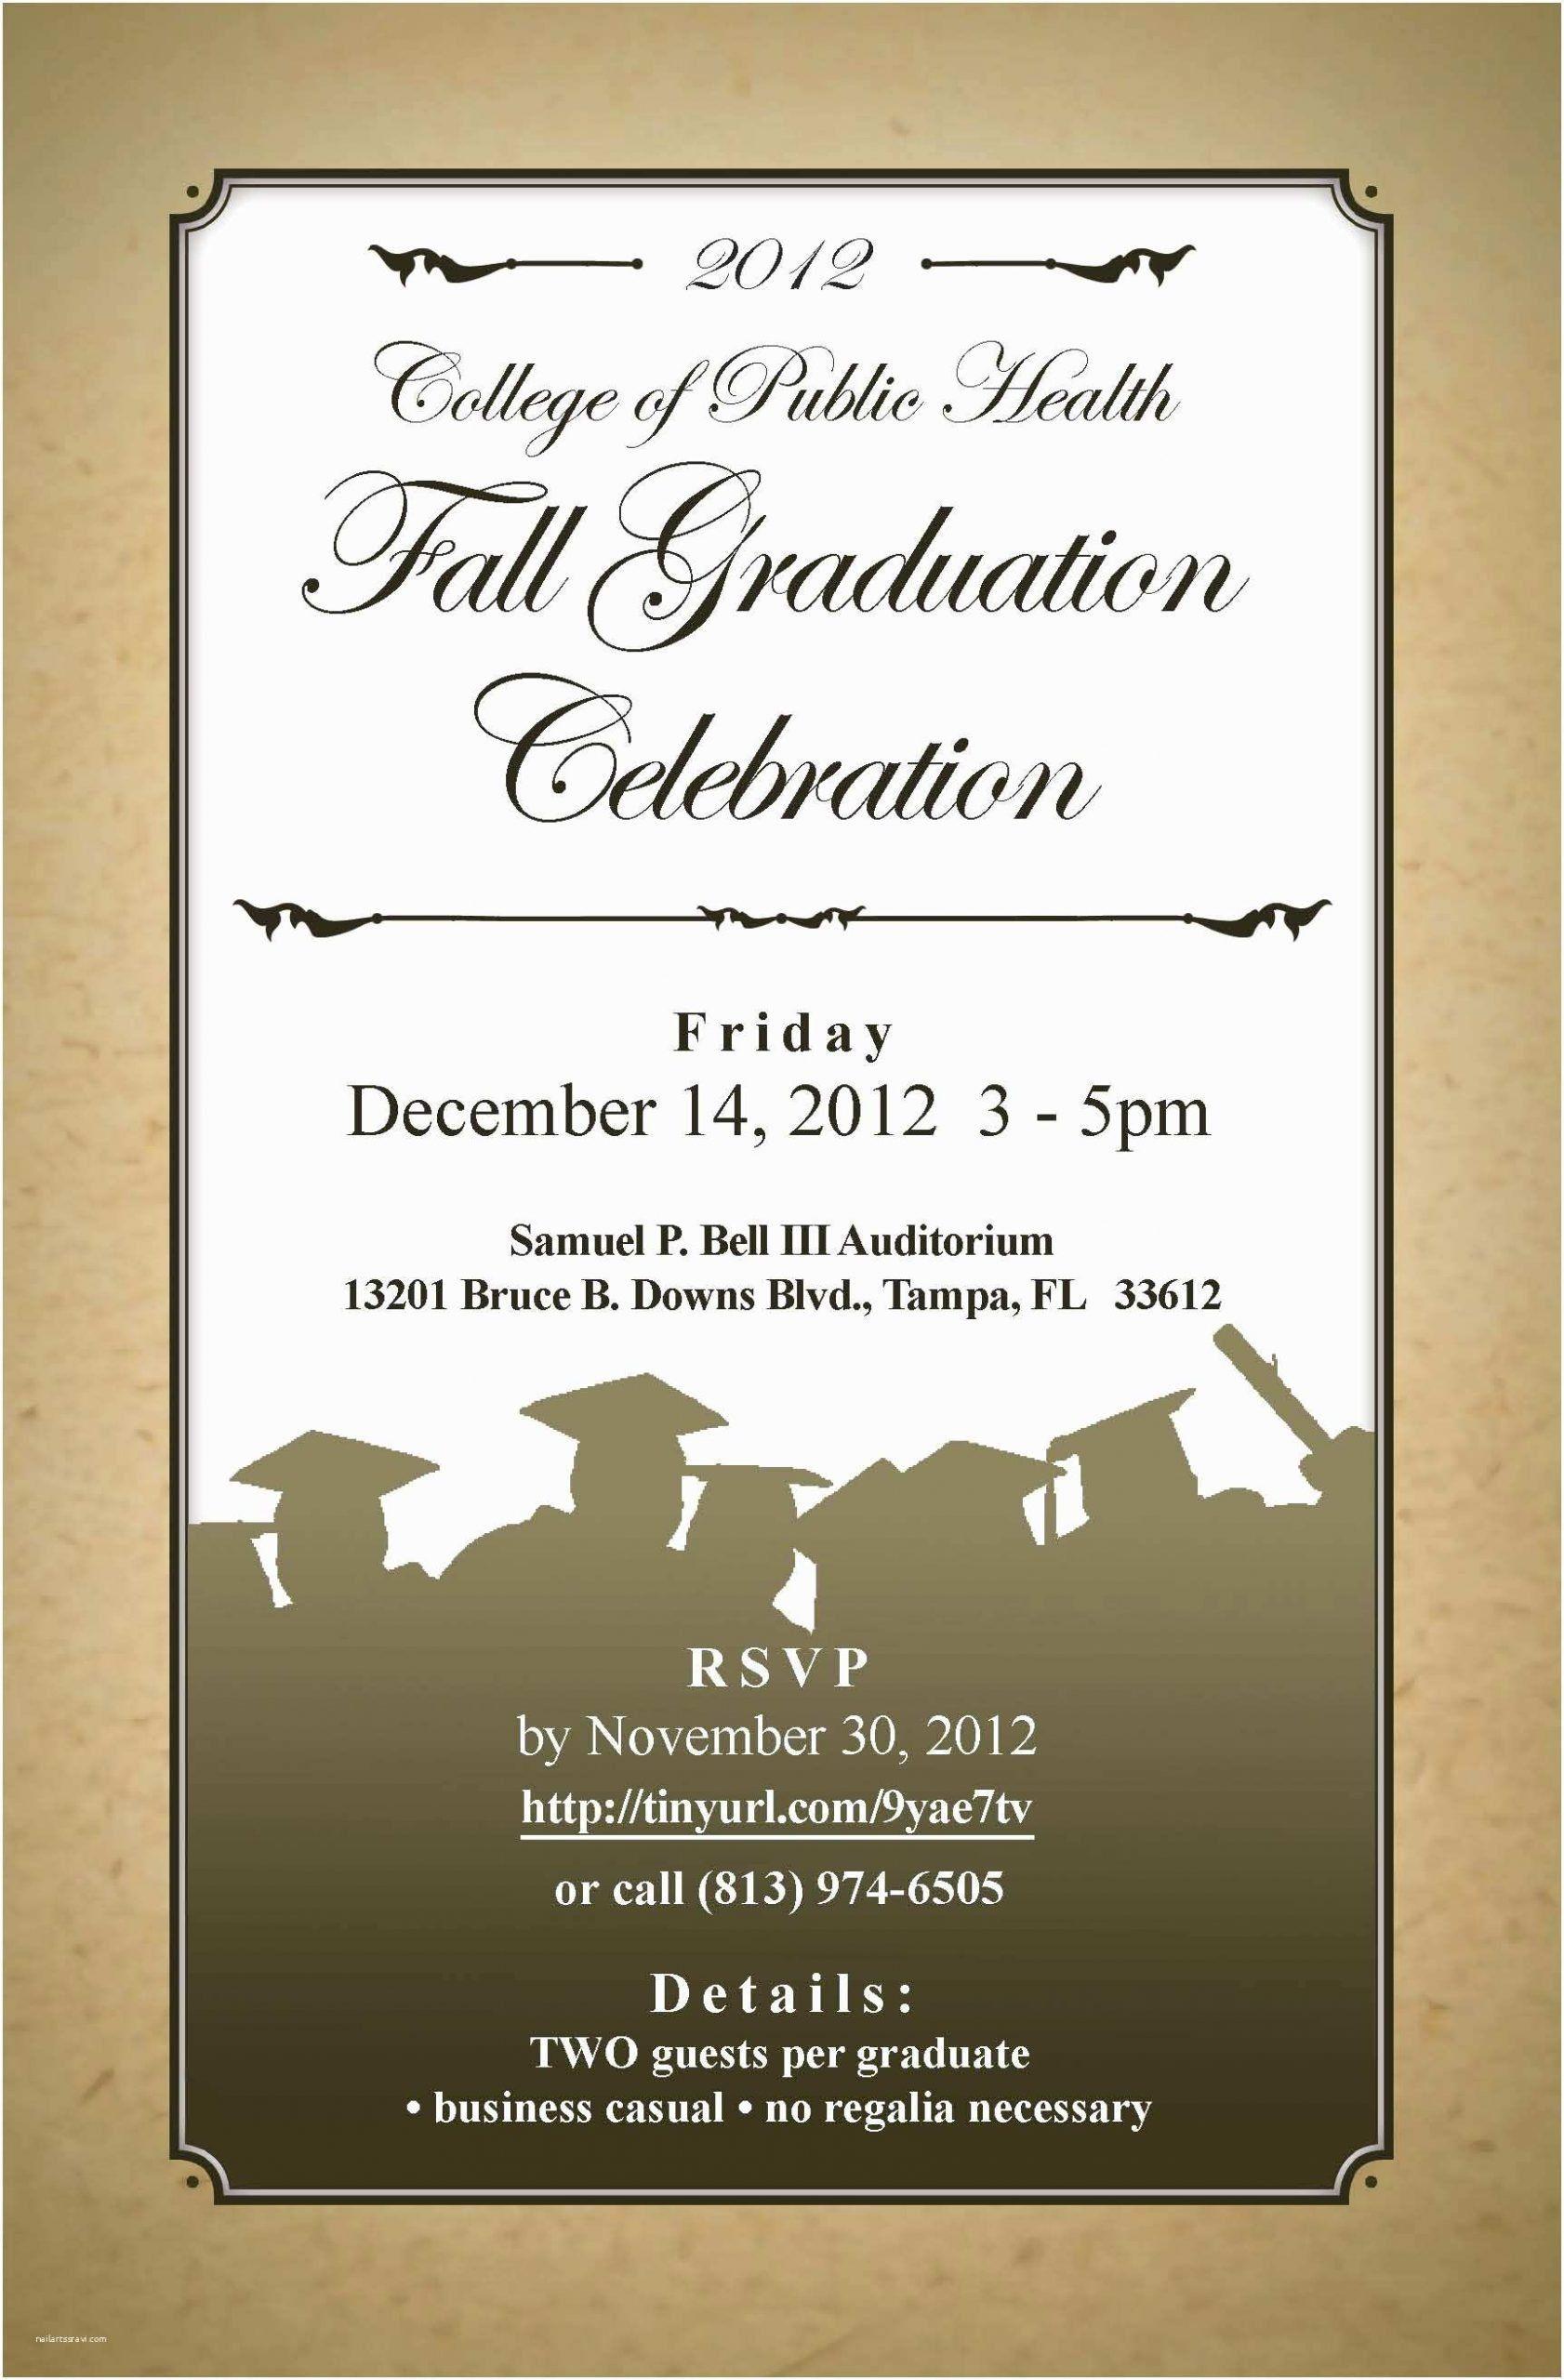 Graduation Invitation Card Templates Inspirational Graduation Cer Graduation Invitation Wording Graduation Invitation Cards Graduation Party Invitation Wording